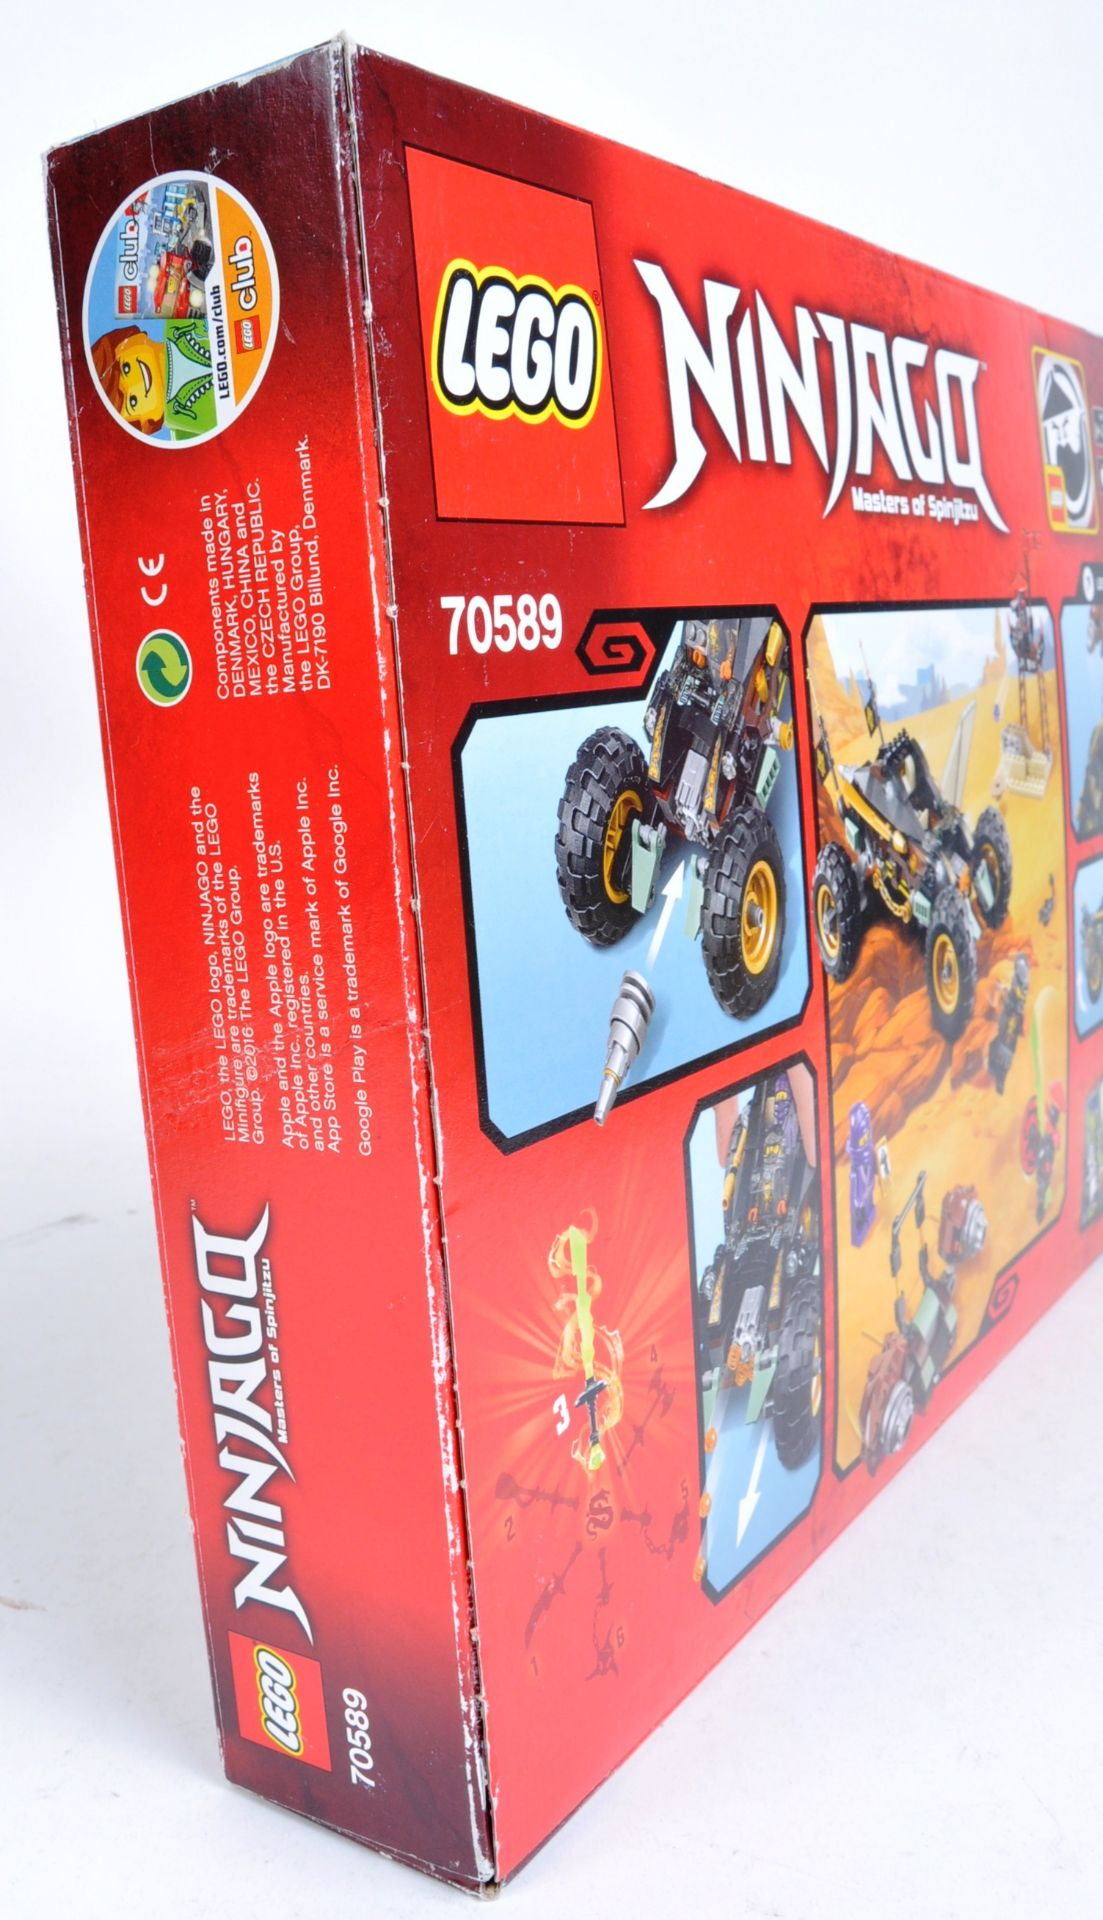 LEGO SETS - LEGO NINJAGO - 70589 / 70592 / 70746 / 70748 - Image 6 of 10